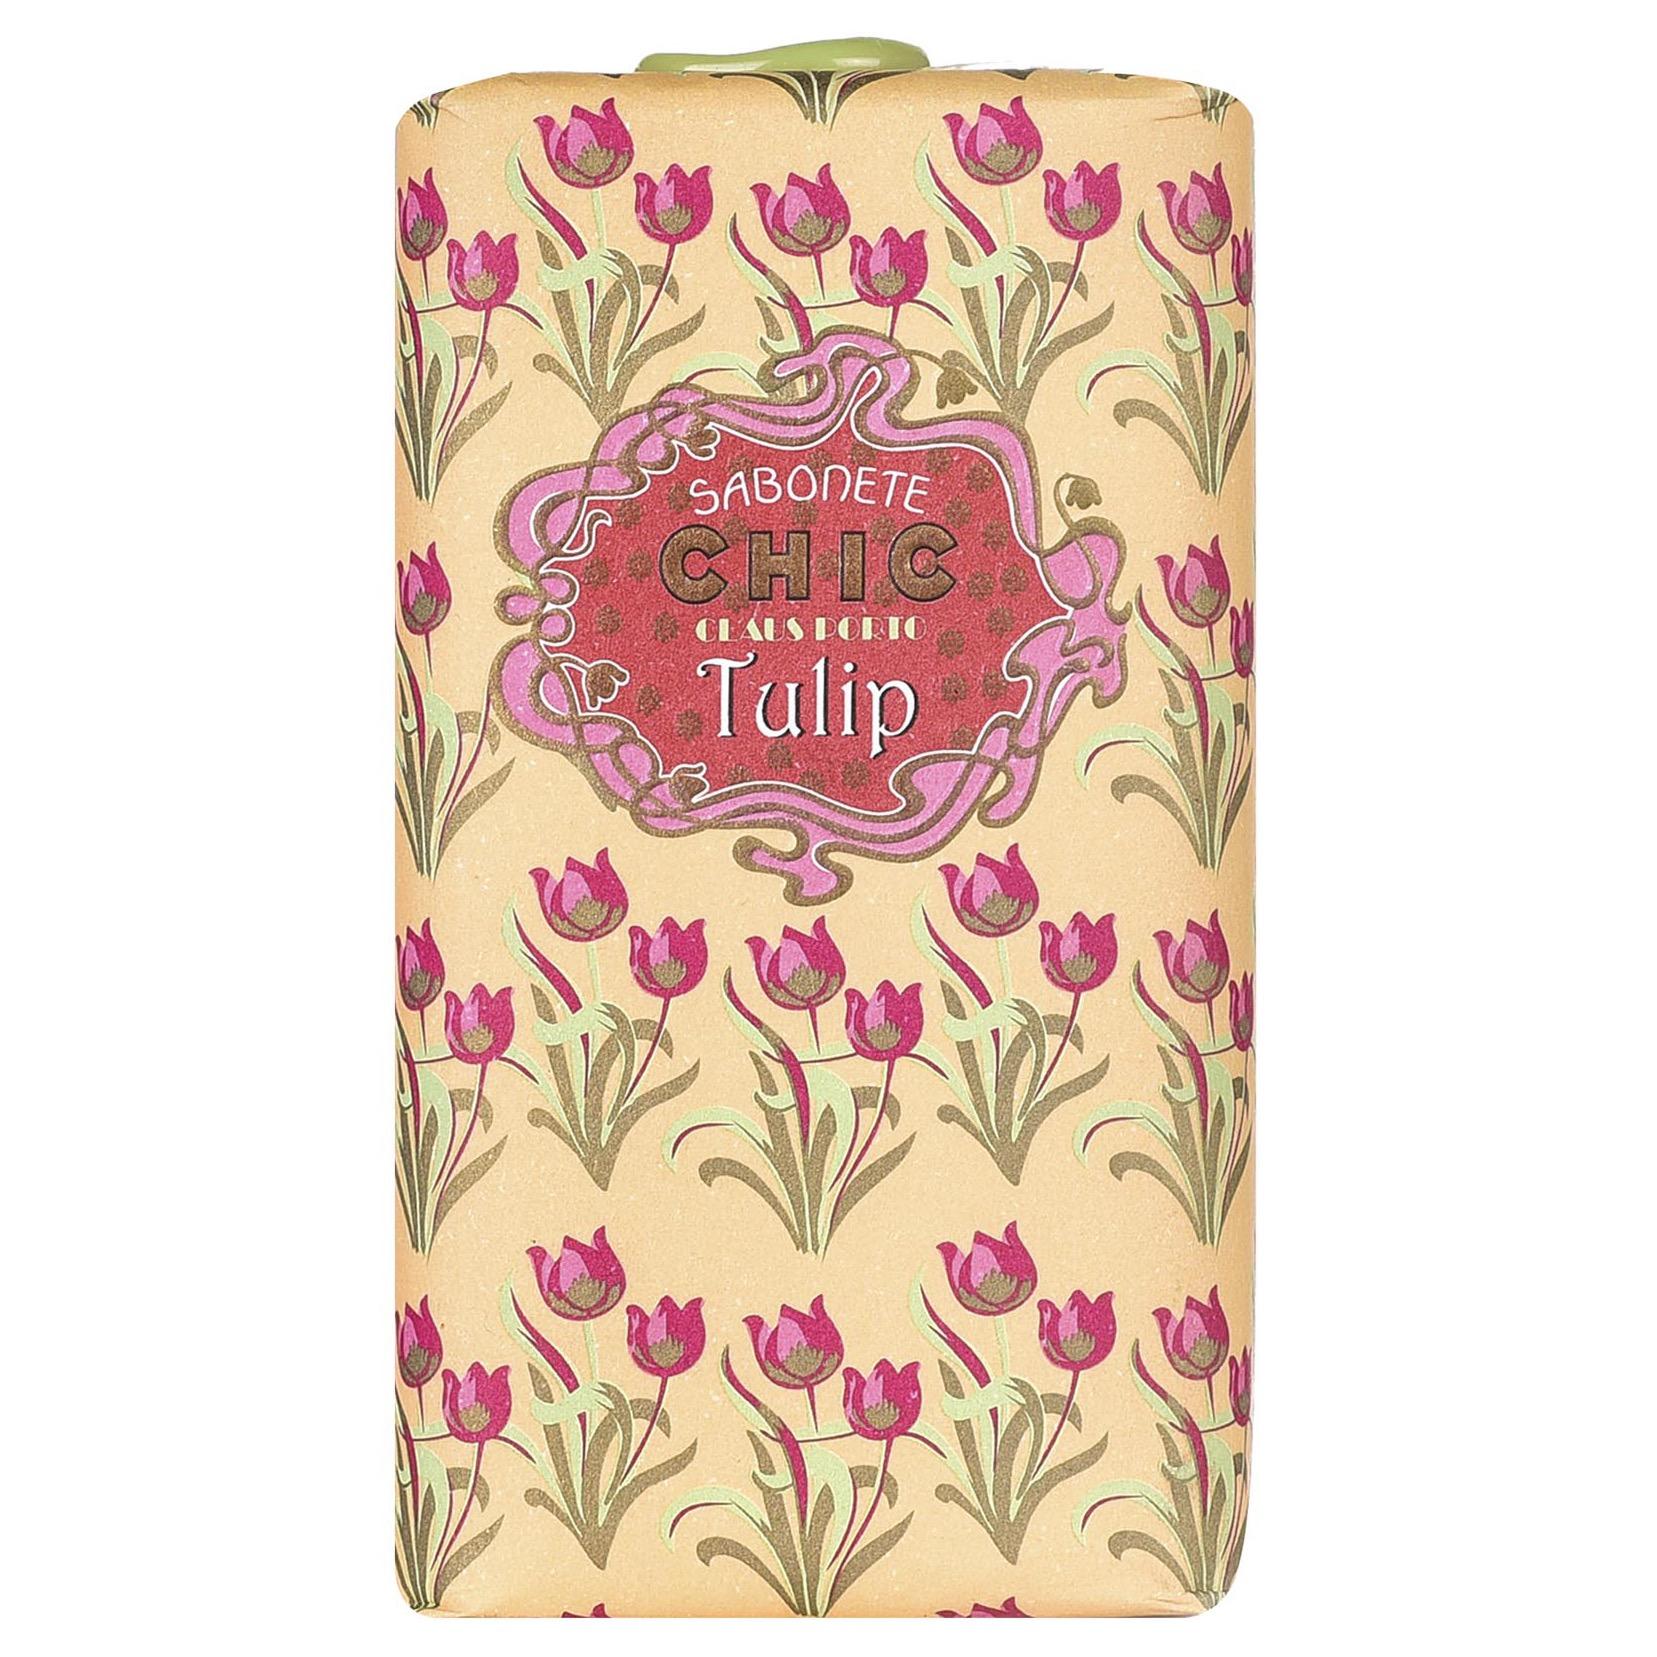 Soap Bar Chic - Tulip